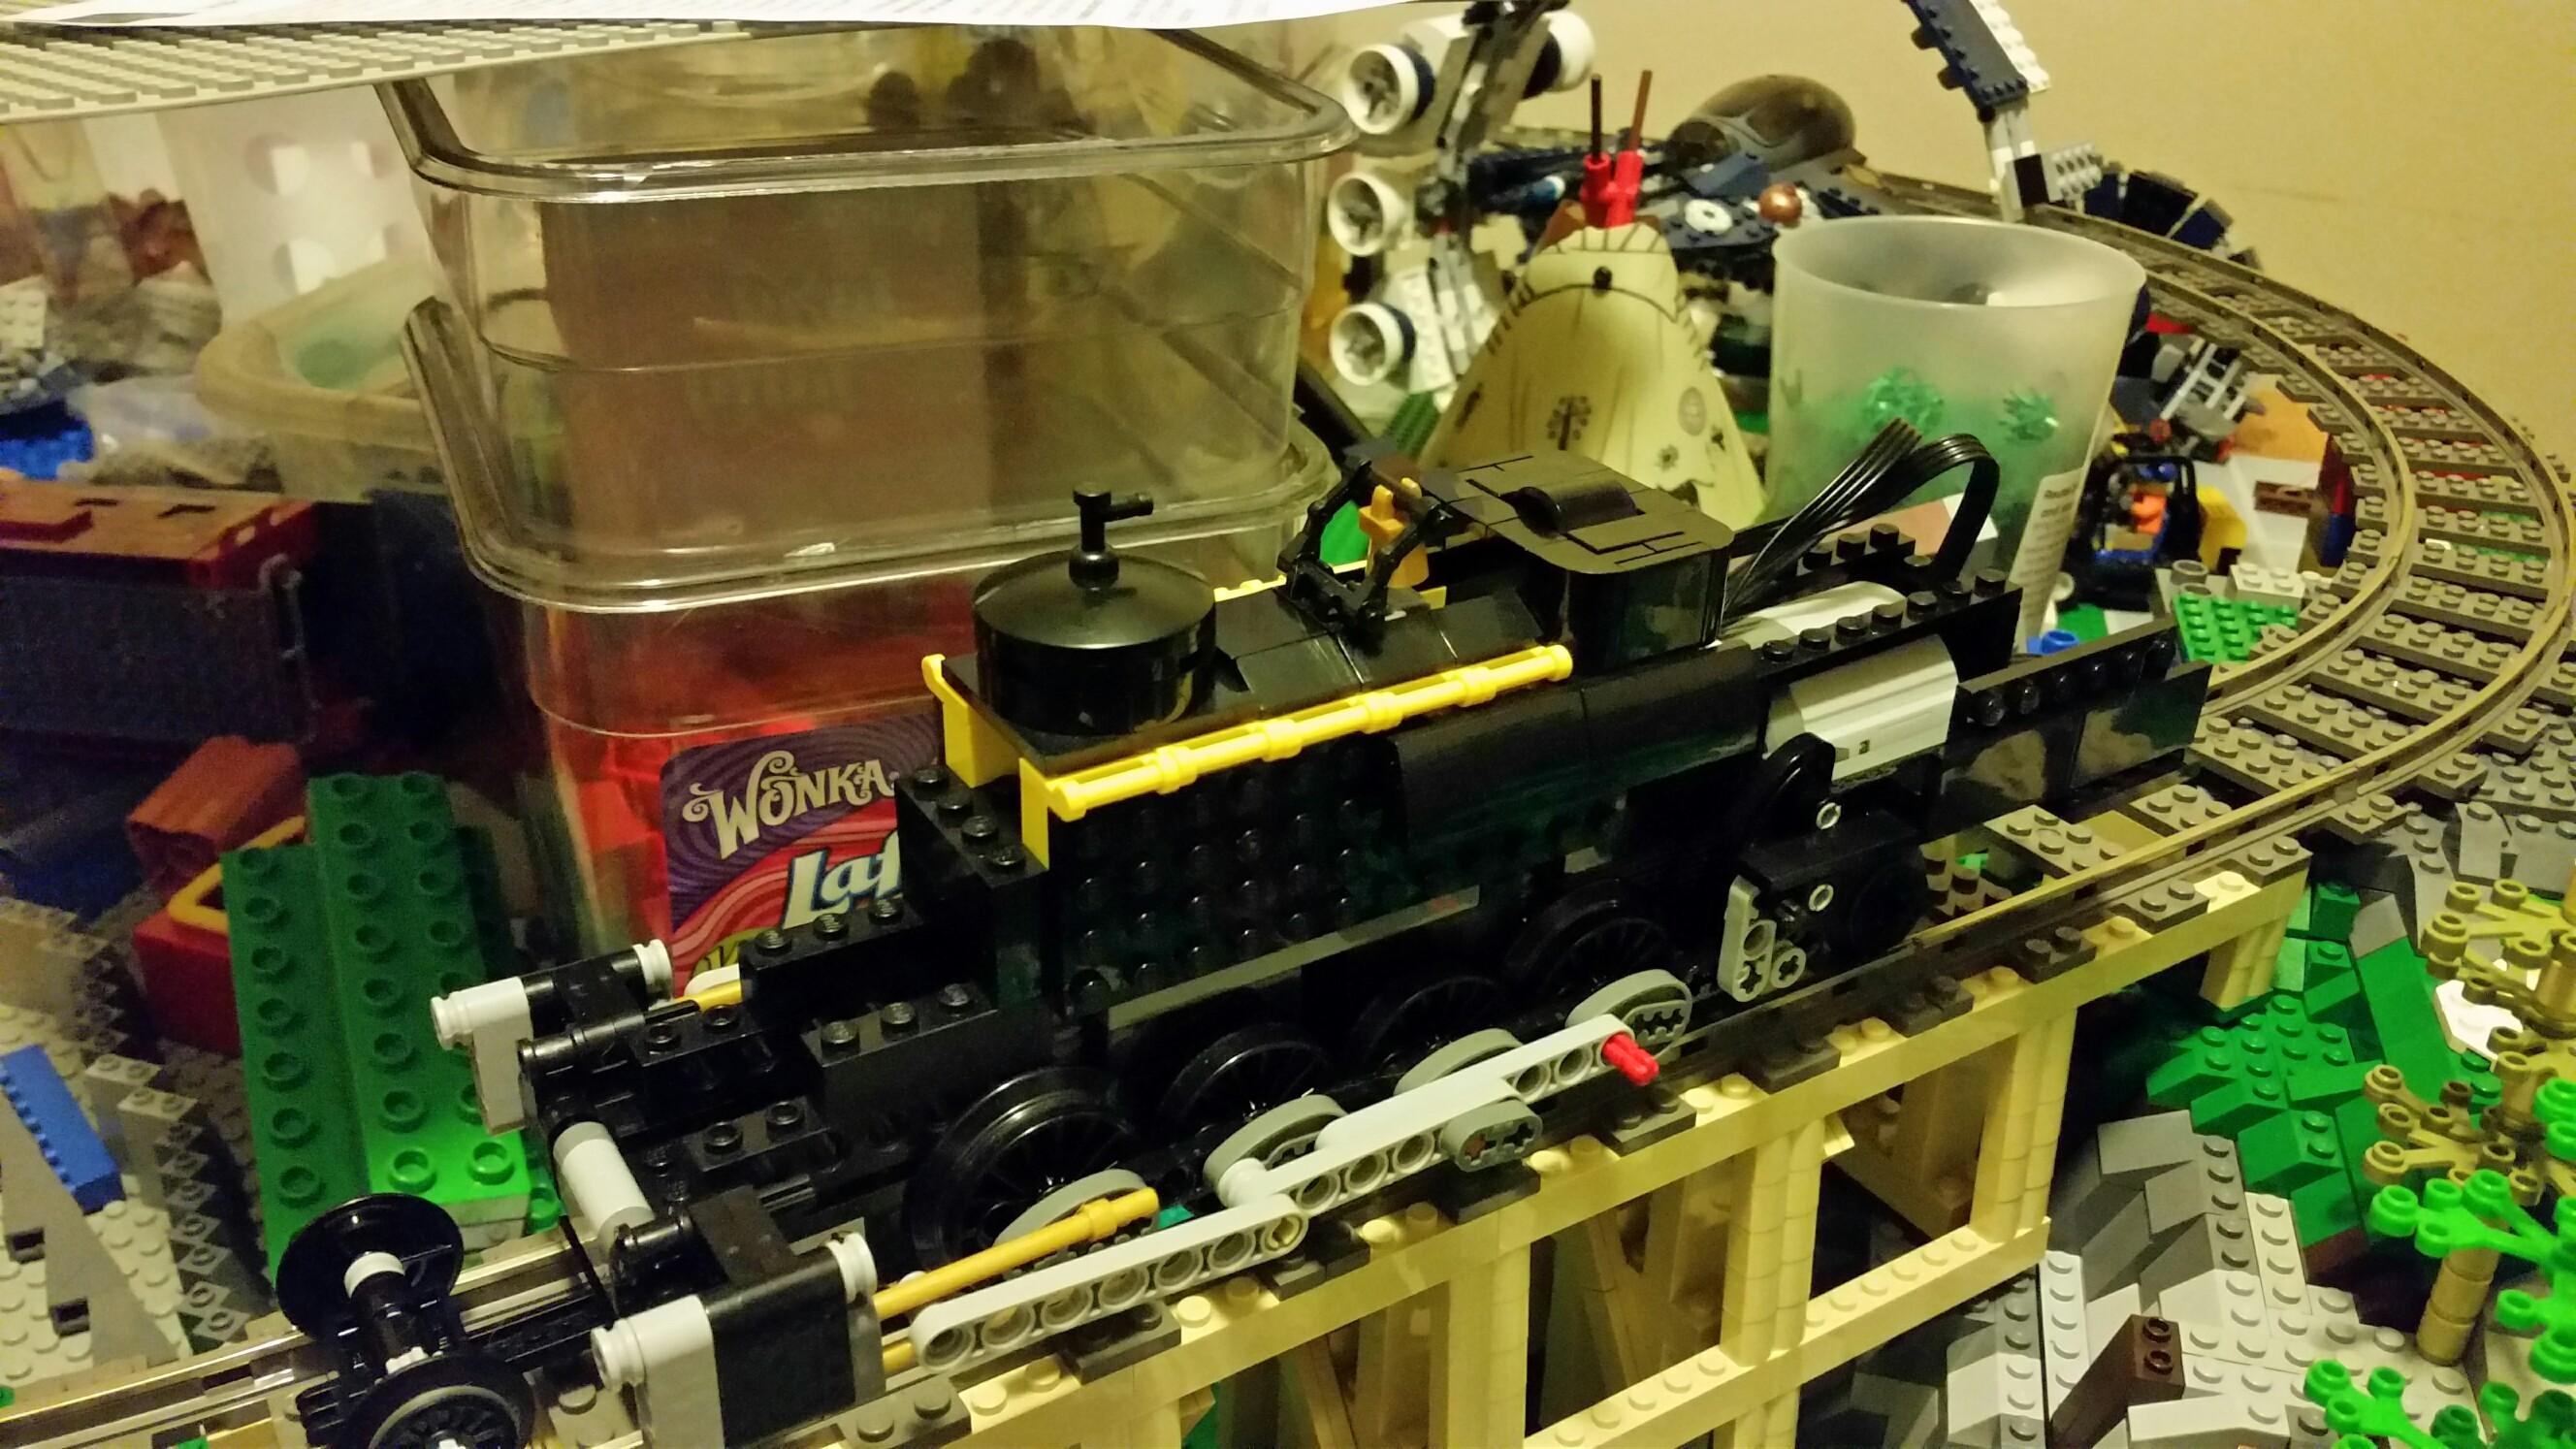 engine_3-2656x1494.jpg